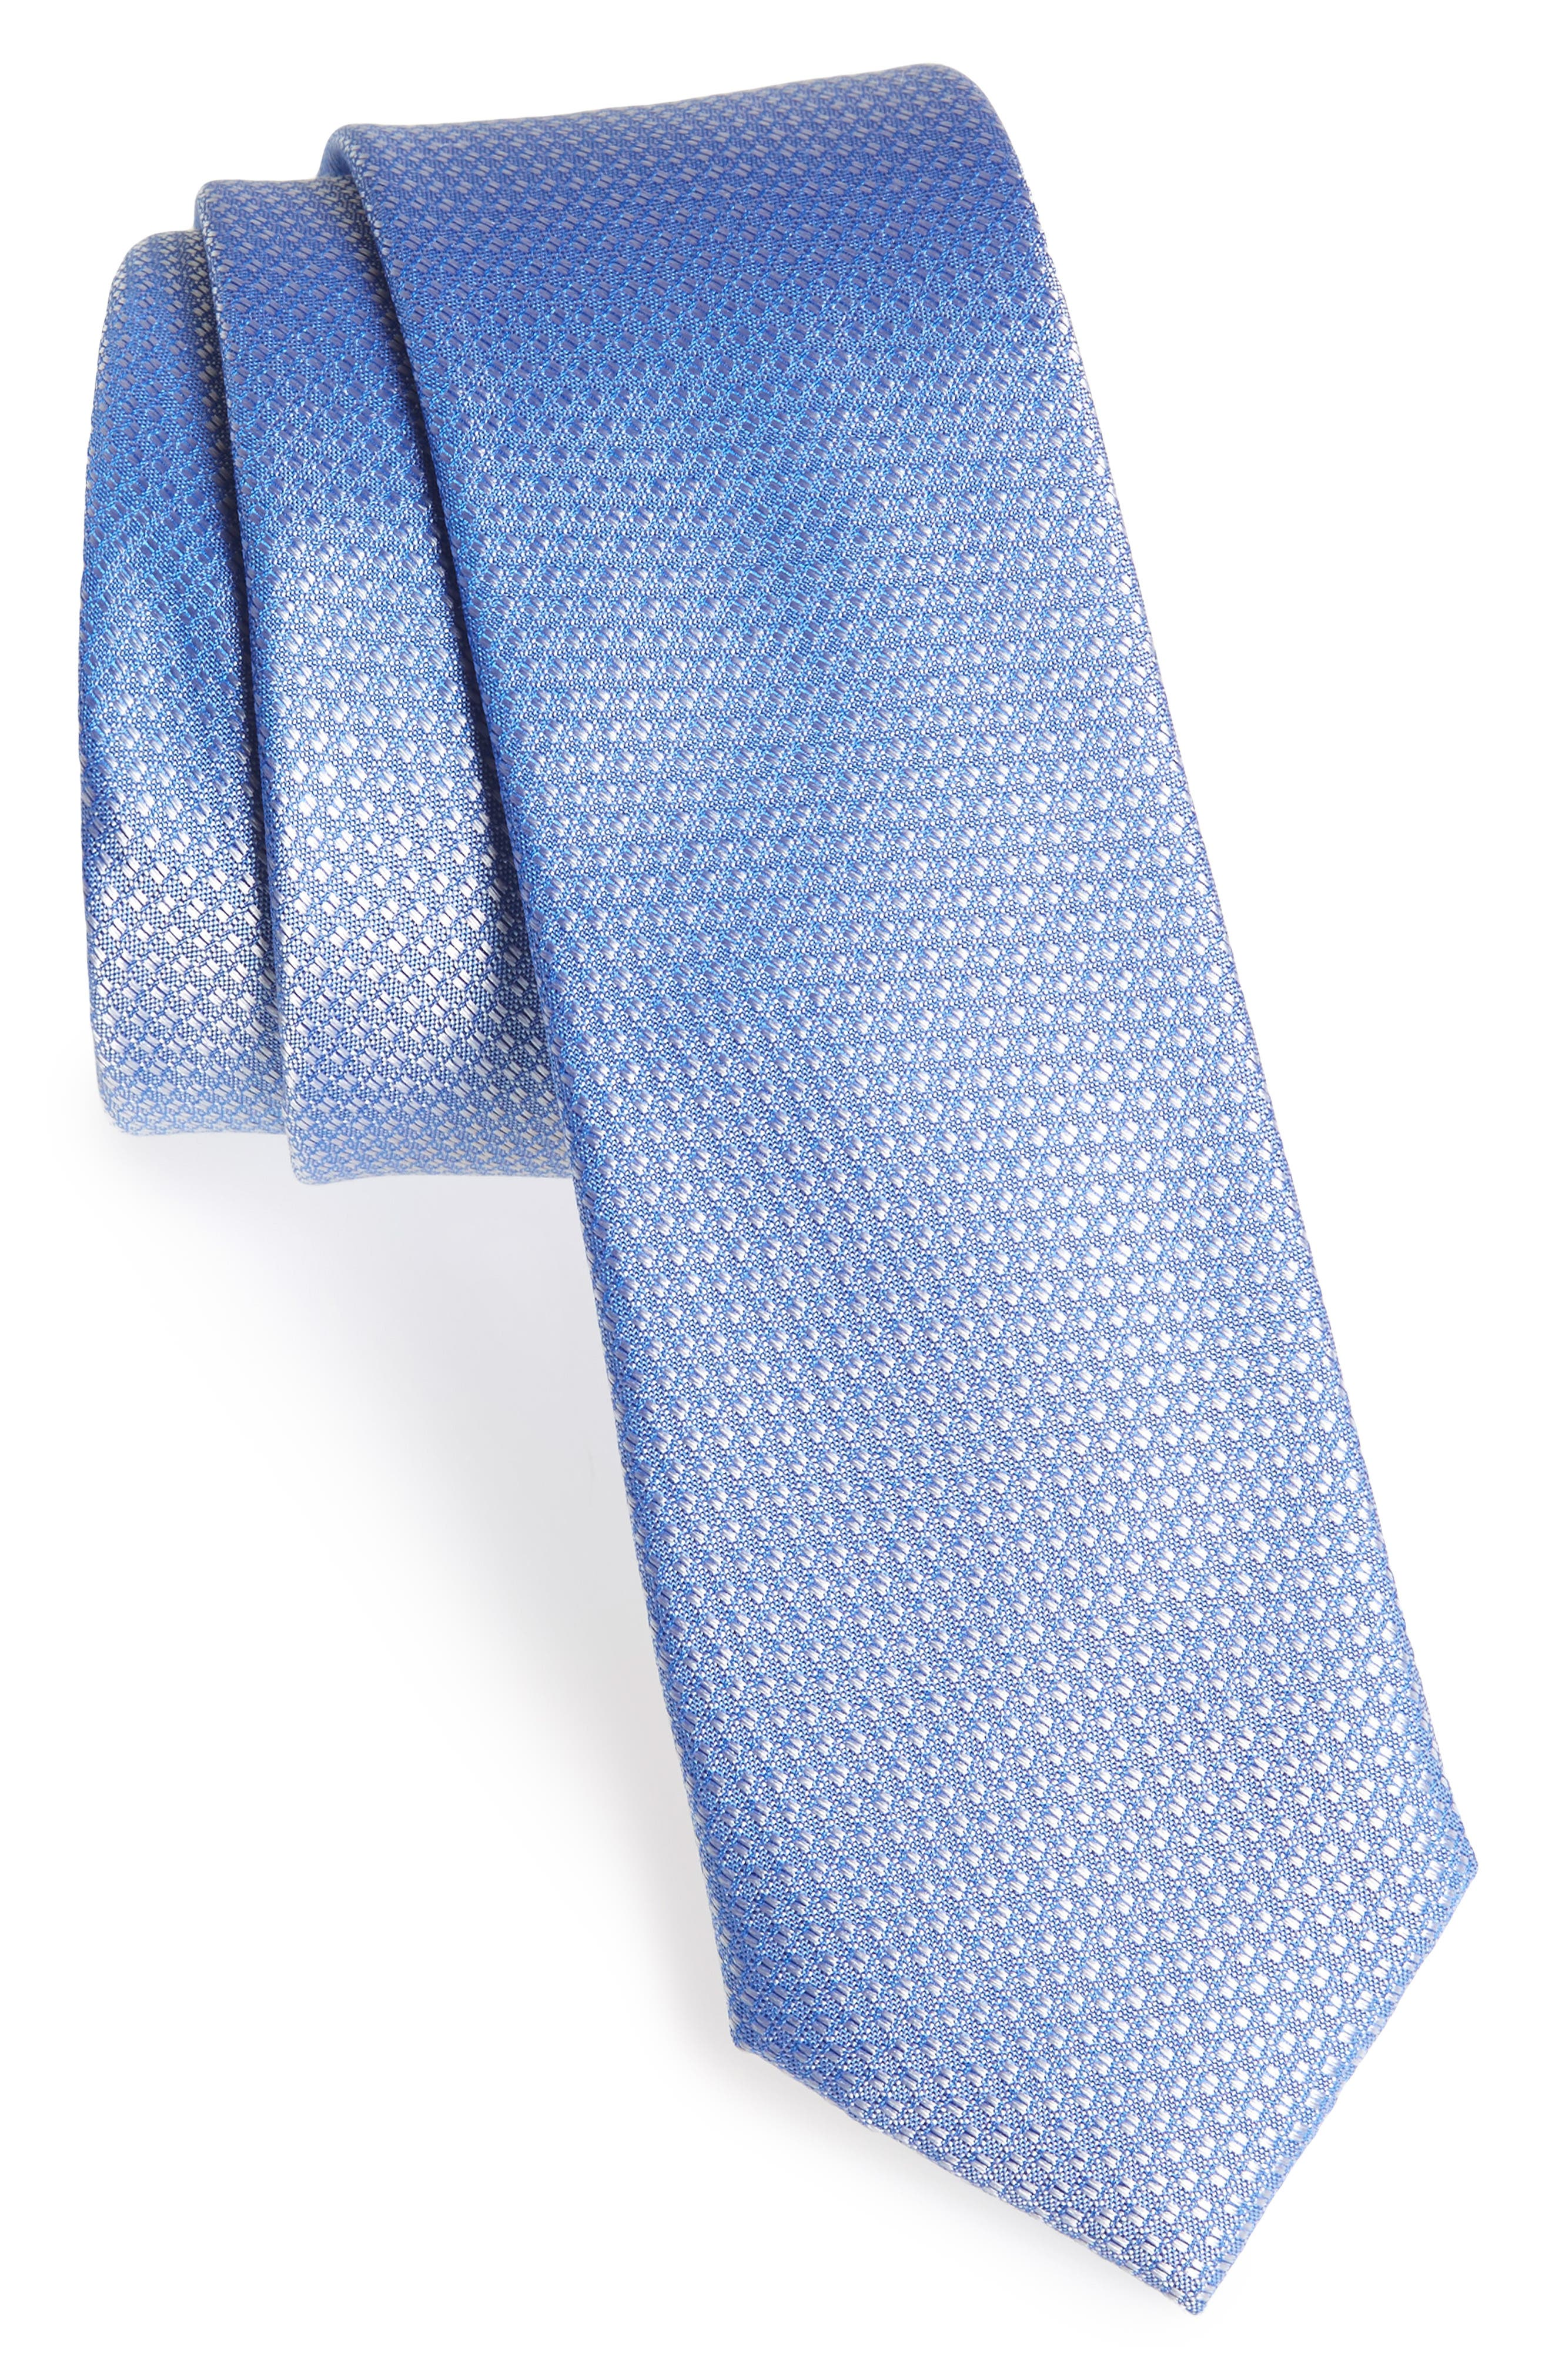 Seattle Textured Silk Tie,                             Alternate thumbnail 46, color,